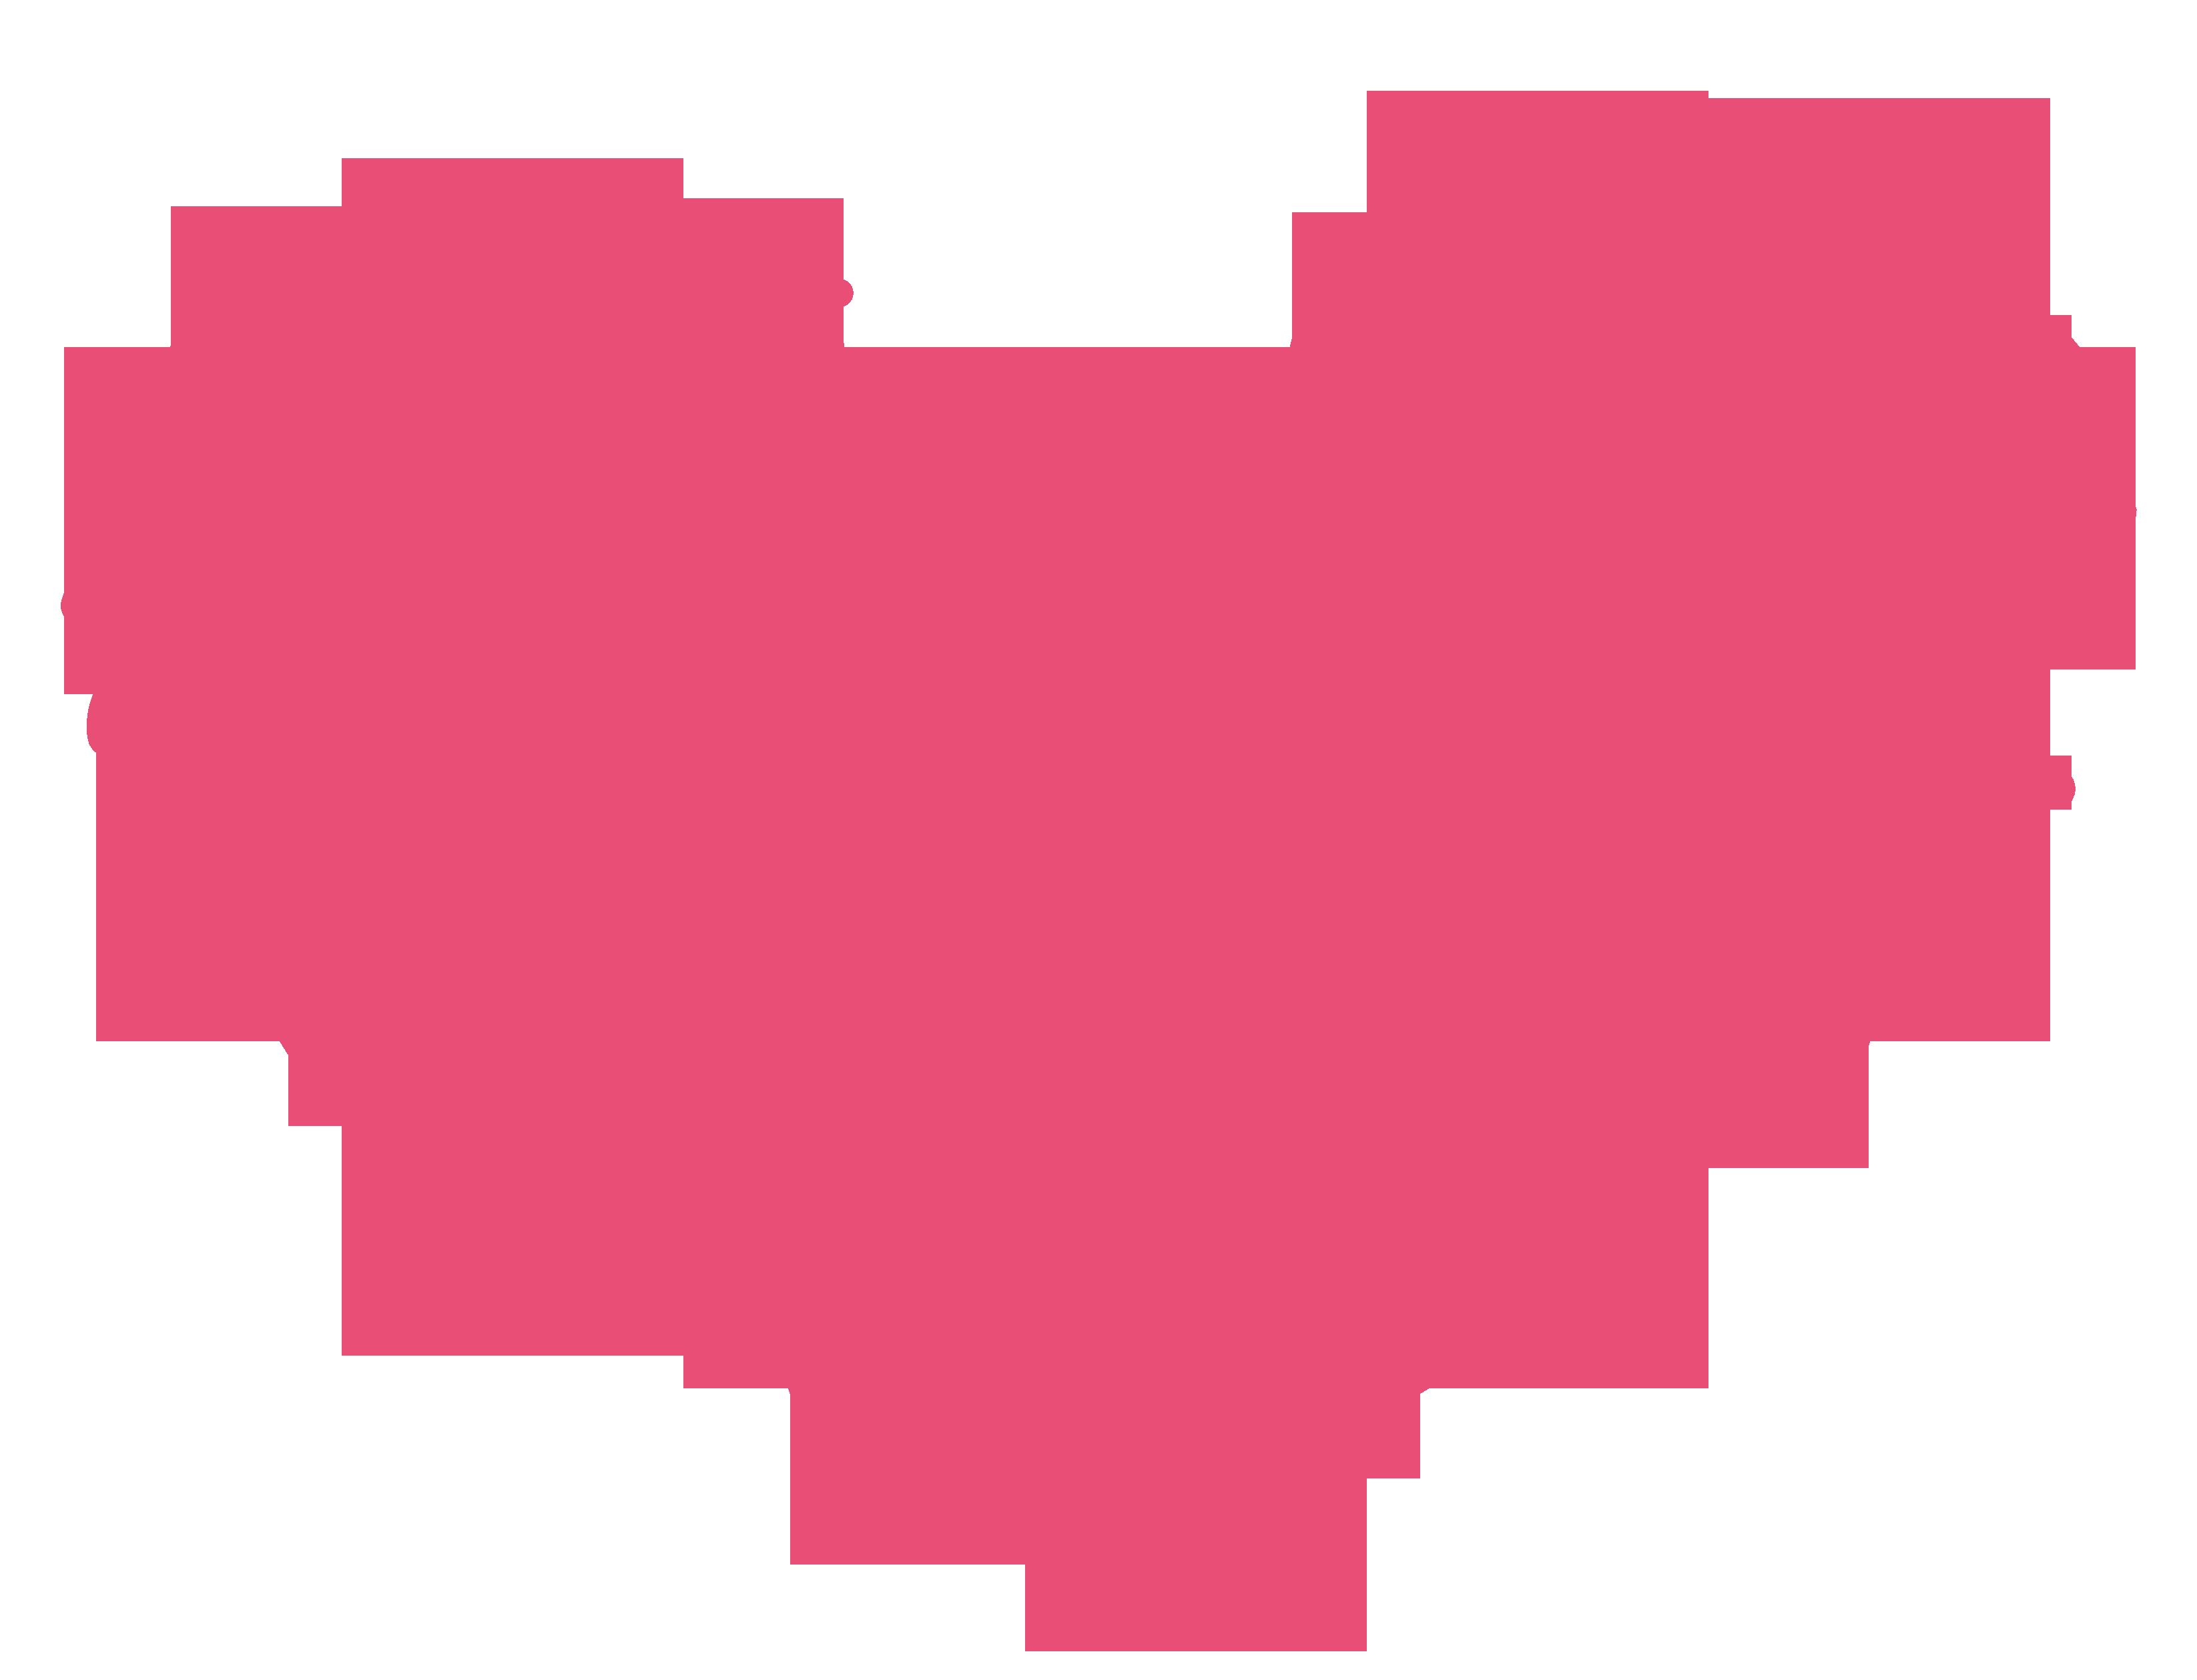 Heart clipart exercising clip art library download Doodle Heart Clipart - Karen Cookie Jar | HEARTS/VALENTINES ... clip art library download